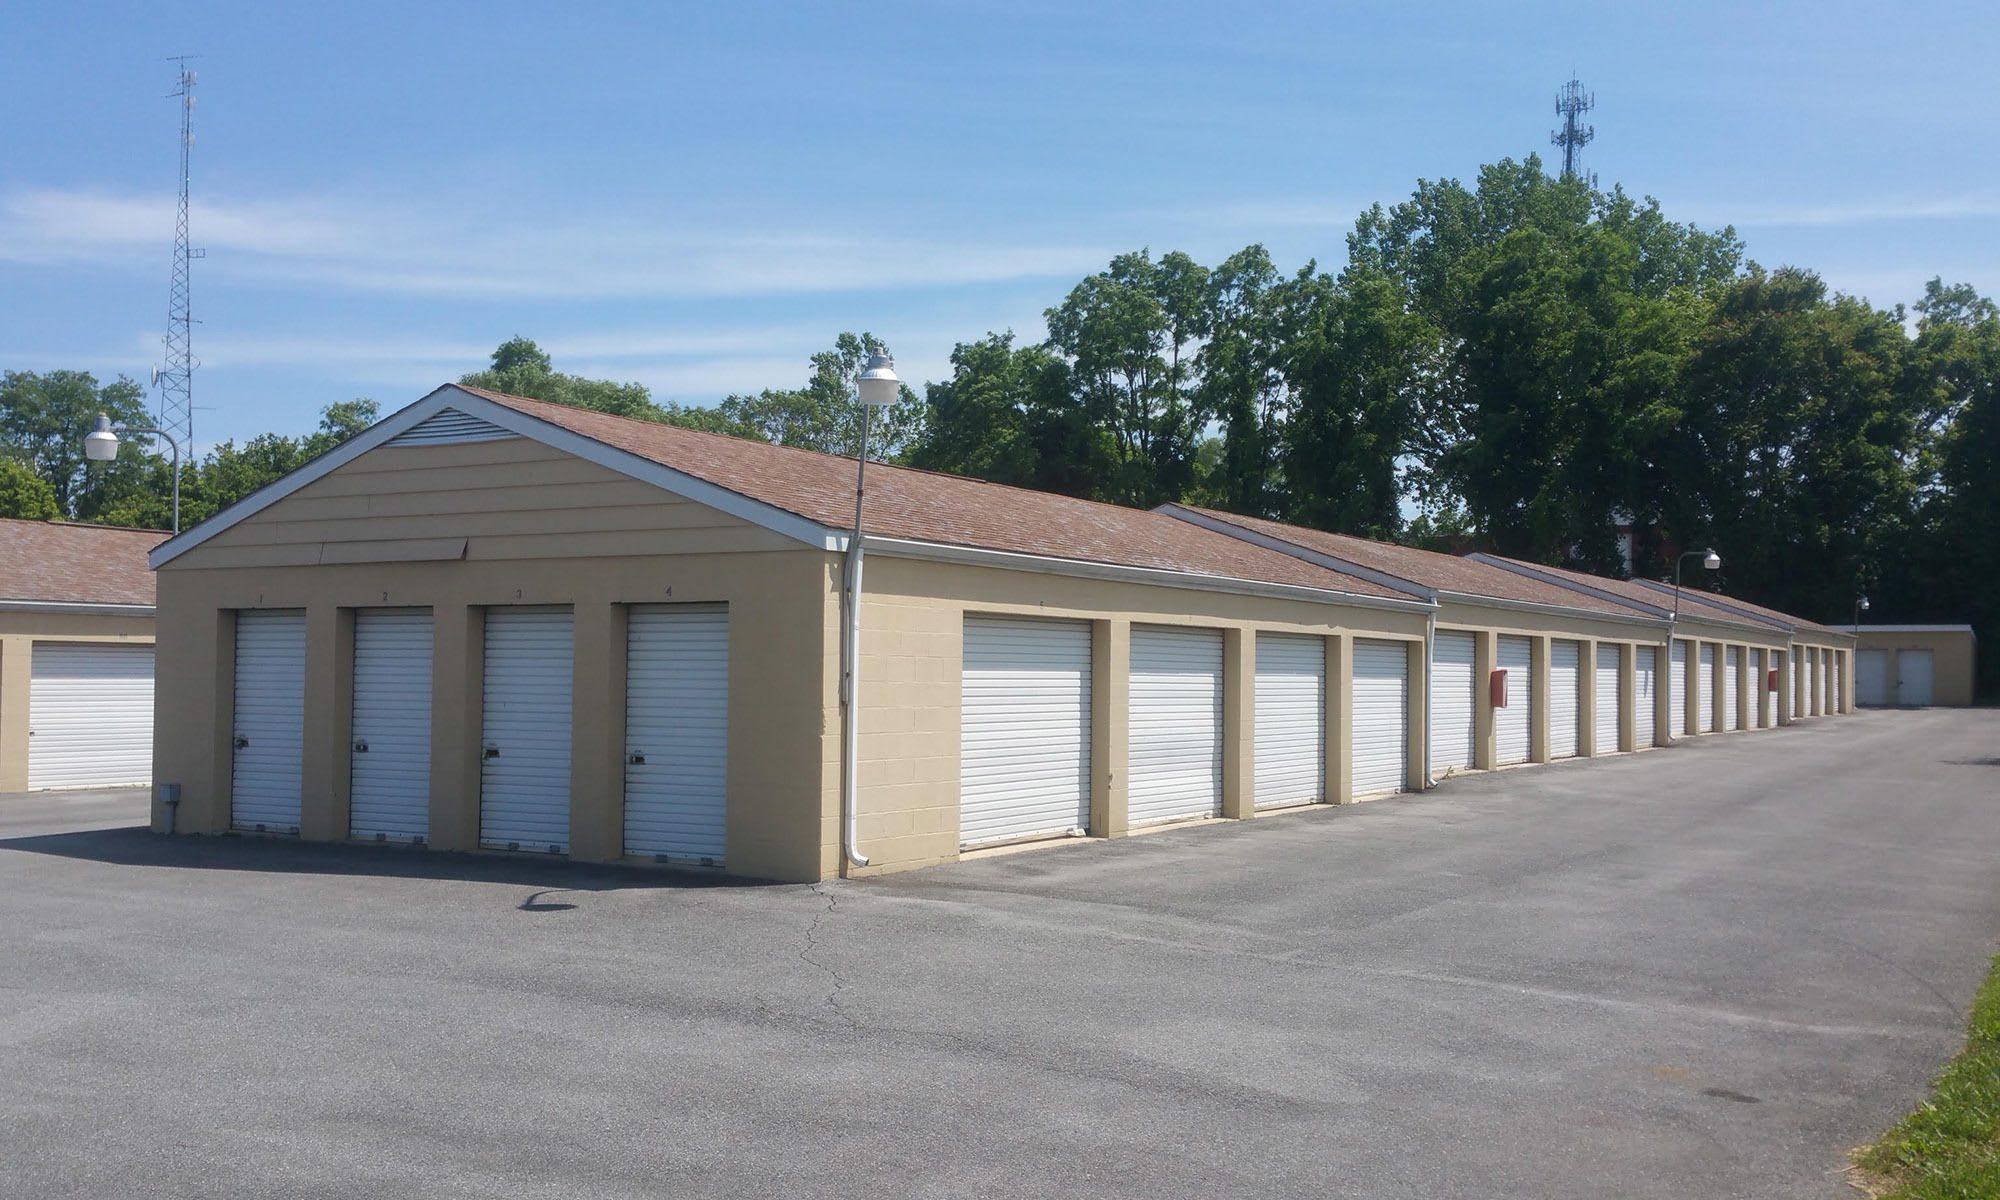 p to storage lock rent parking for derbyshire ripley garage in up